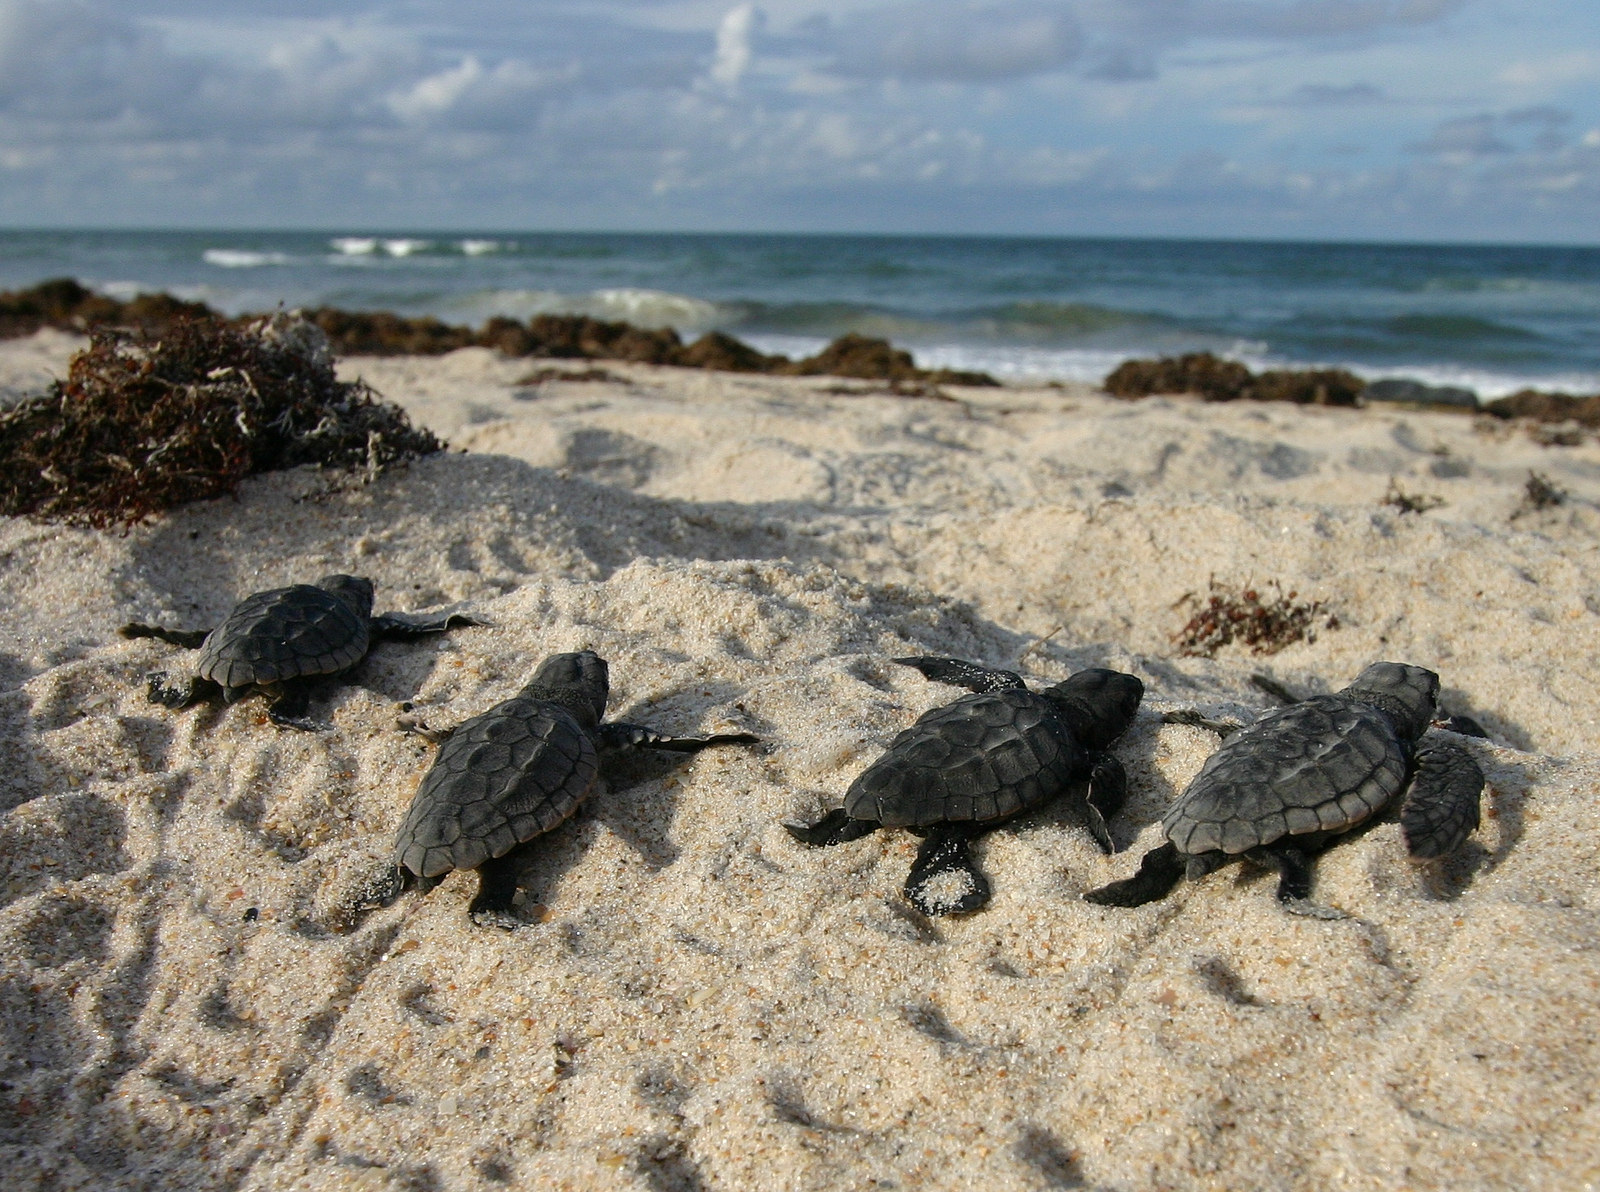 Sea Turtles Pompano Beach